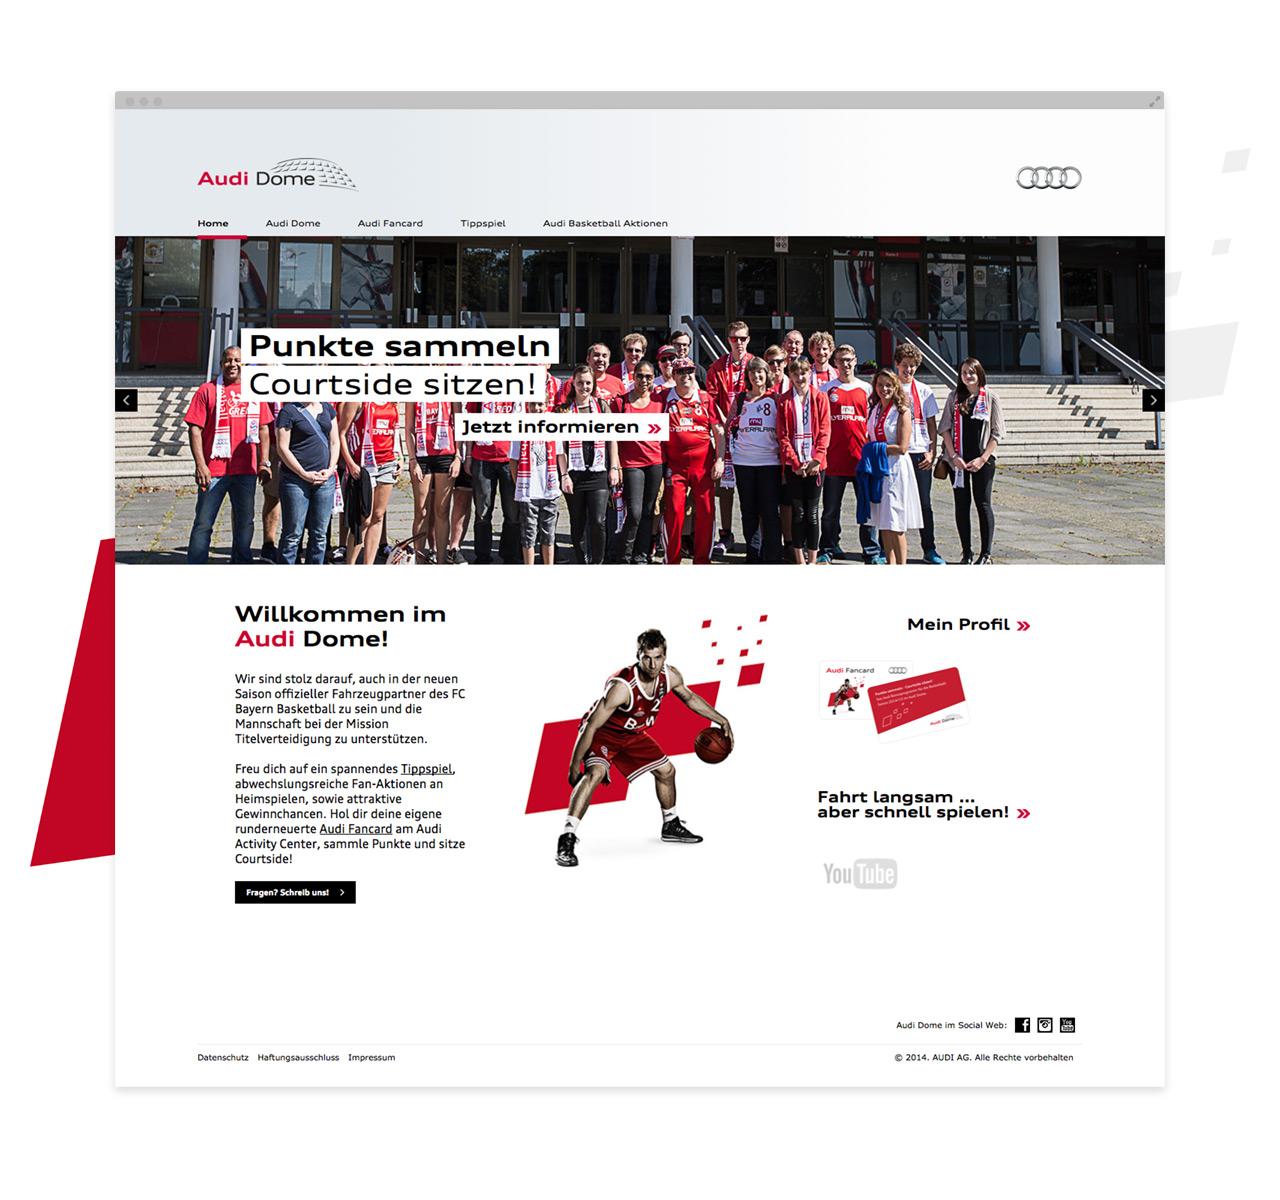 Audi Dome Fans - Startseite